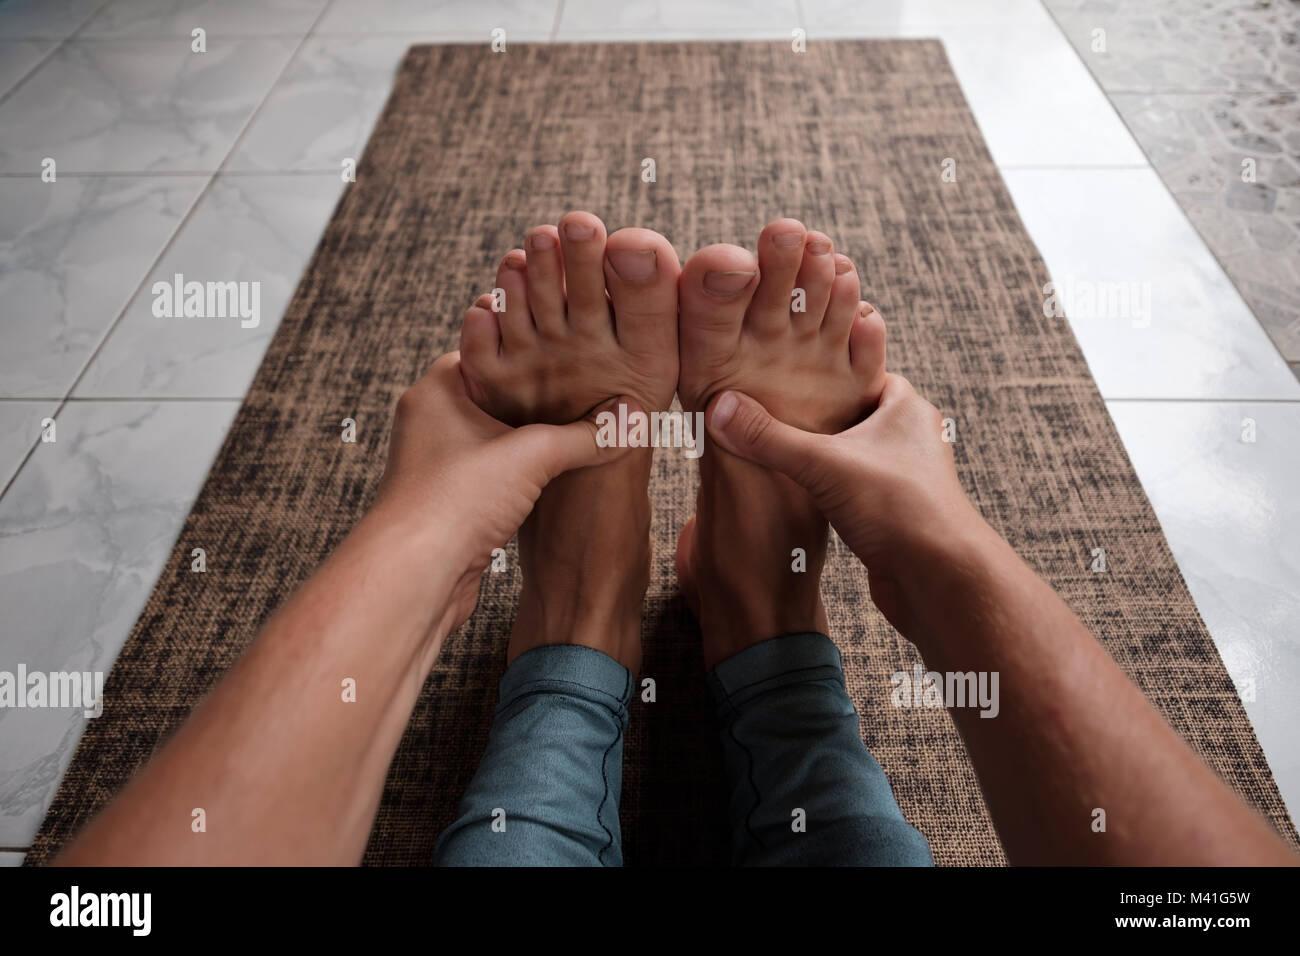 Paschimottanasana or seated forward bend yoga pose - Stock Image